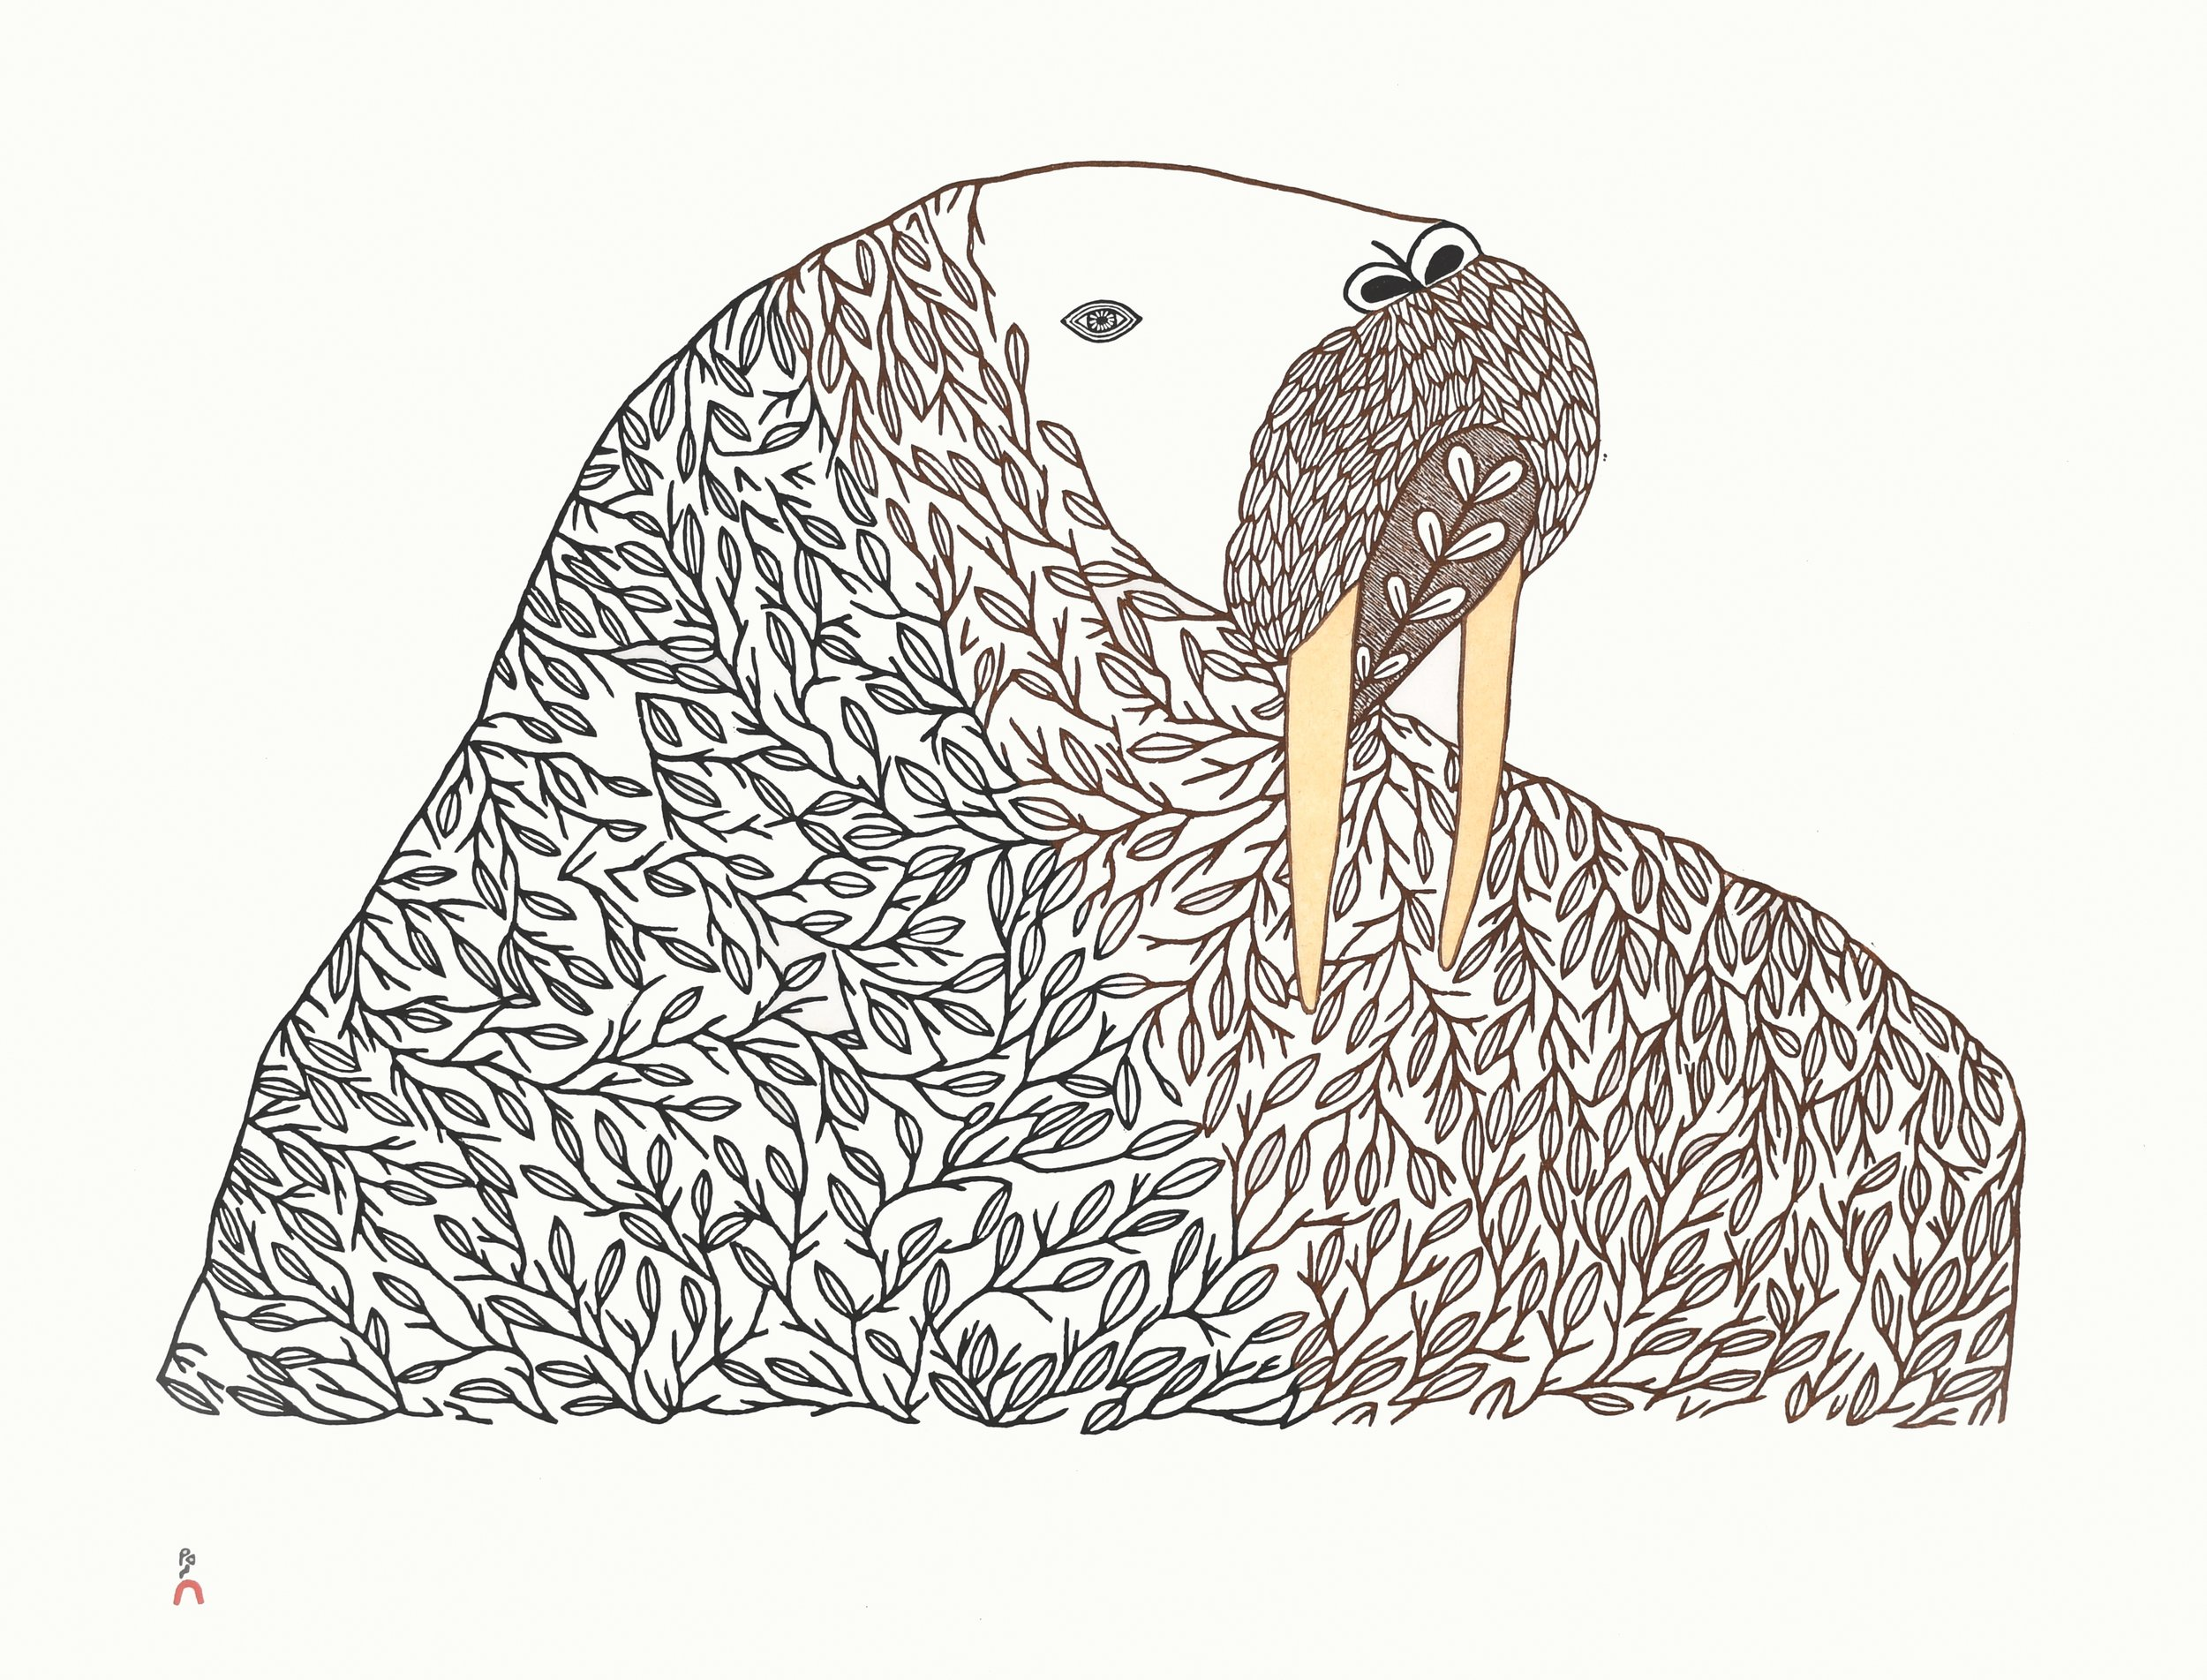 NINGIUKULU TEEVEE  1. Floral Transformation  Stonecut & Stencil  Paper: Kizuki Kozo White  Printer: Qiatsuq Niviaqsi  61.5 x 79.7 cm  $ 1200